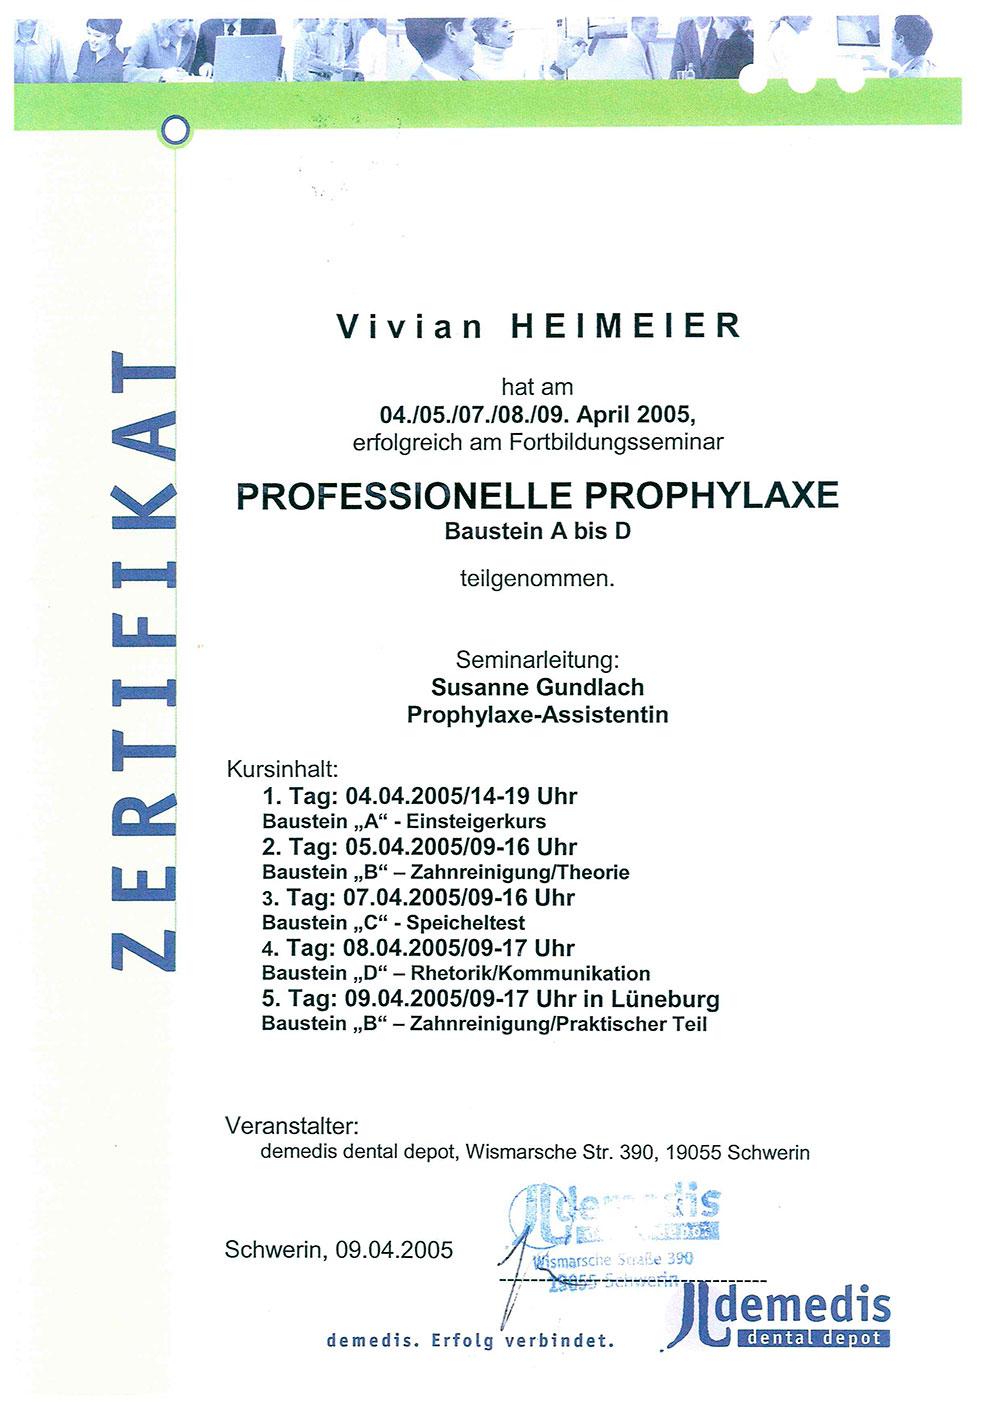 Professionelle-Prohylaxe-Heimeier-II